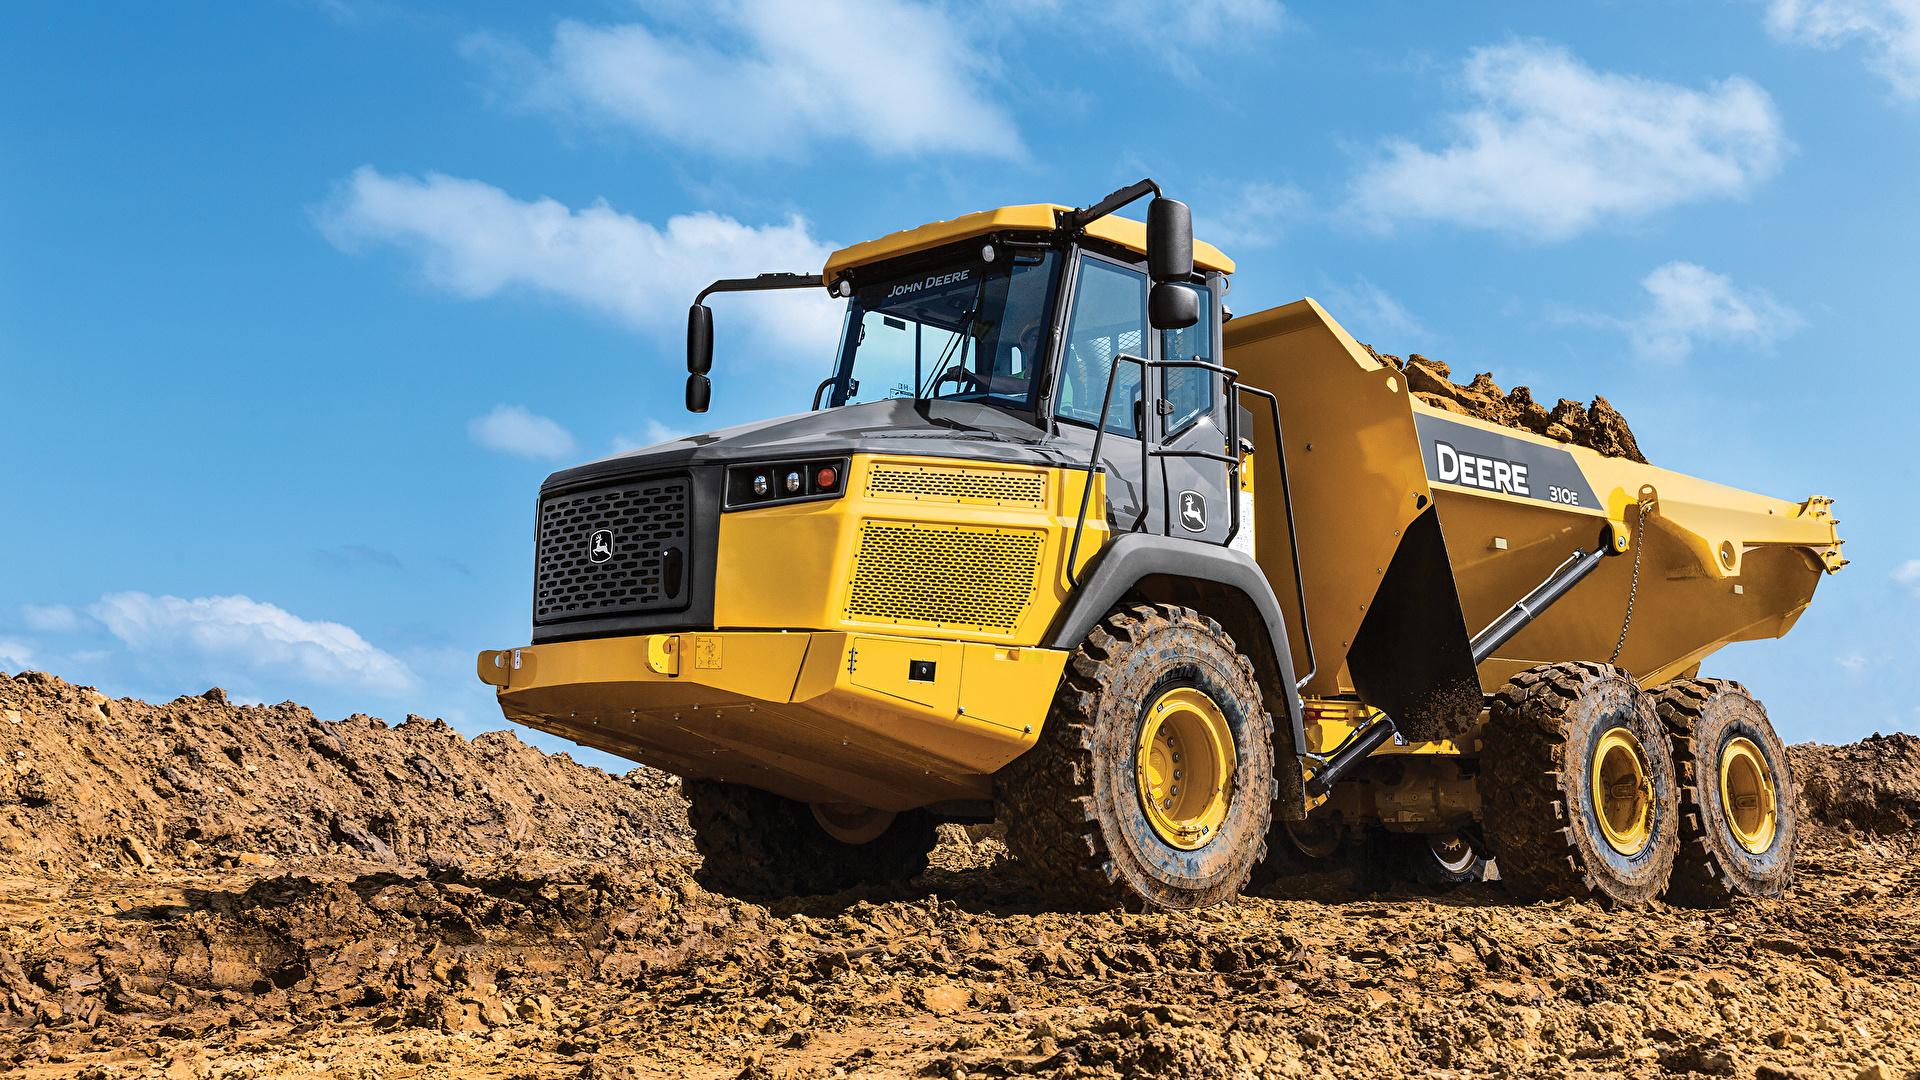 Wallpaper lorry 2017 John Deere 310E Yellow Cars 1920x1080 Trucks auto automobile